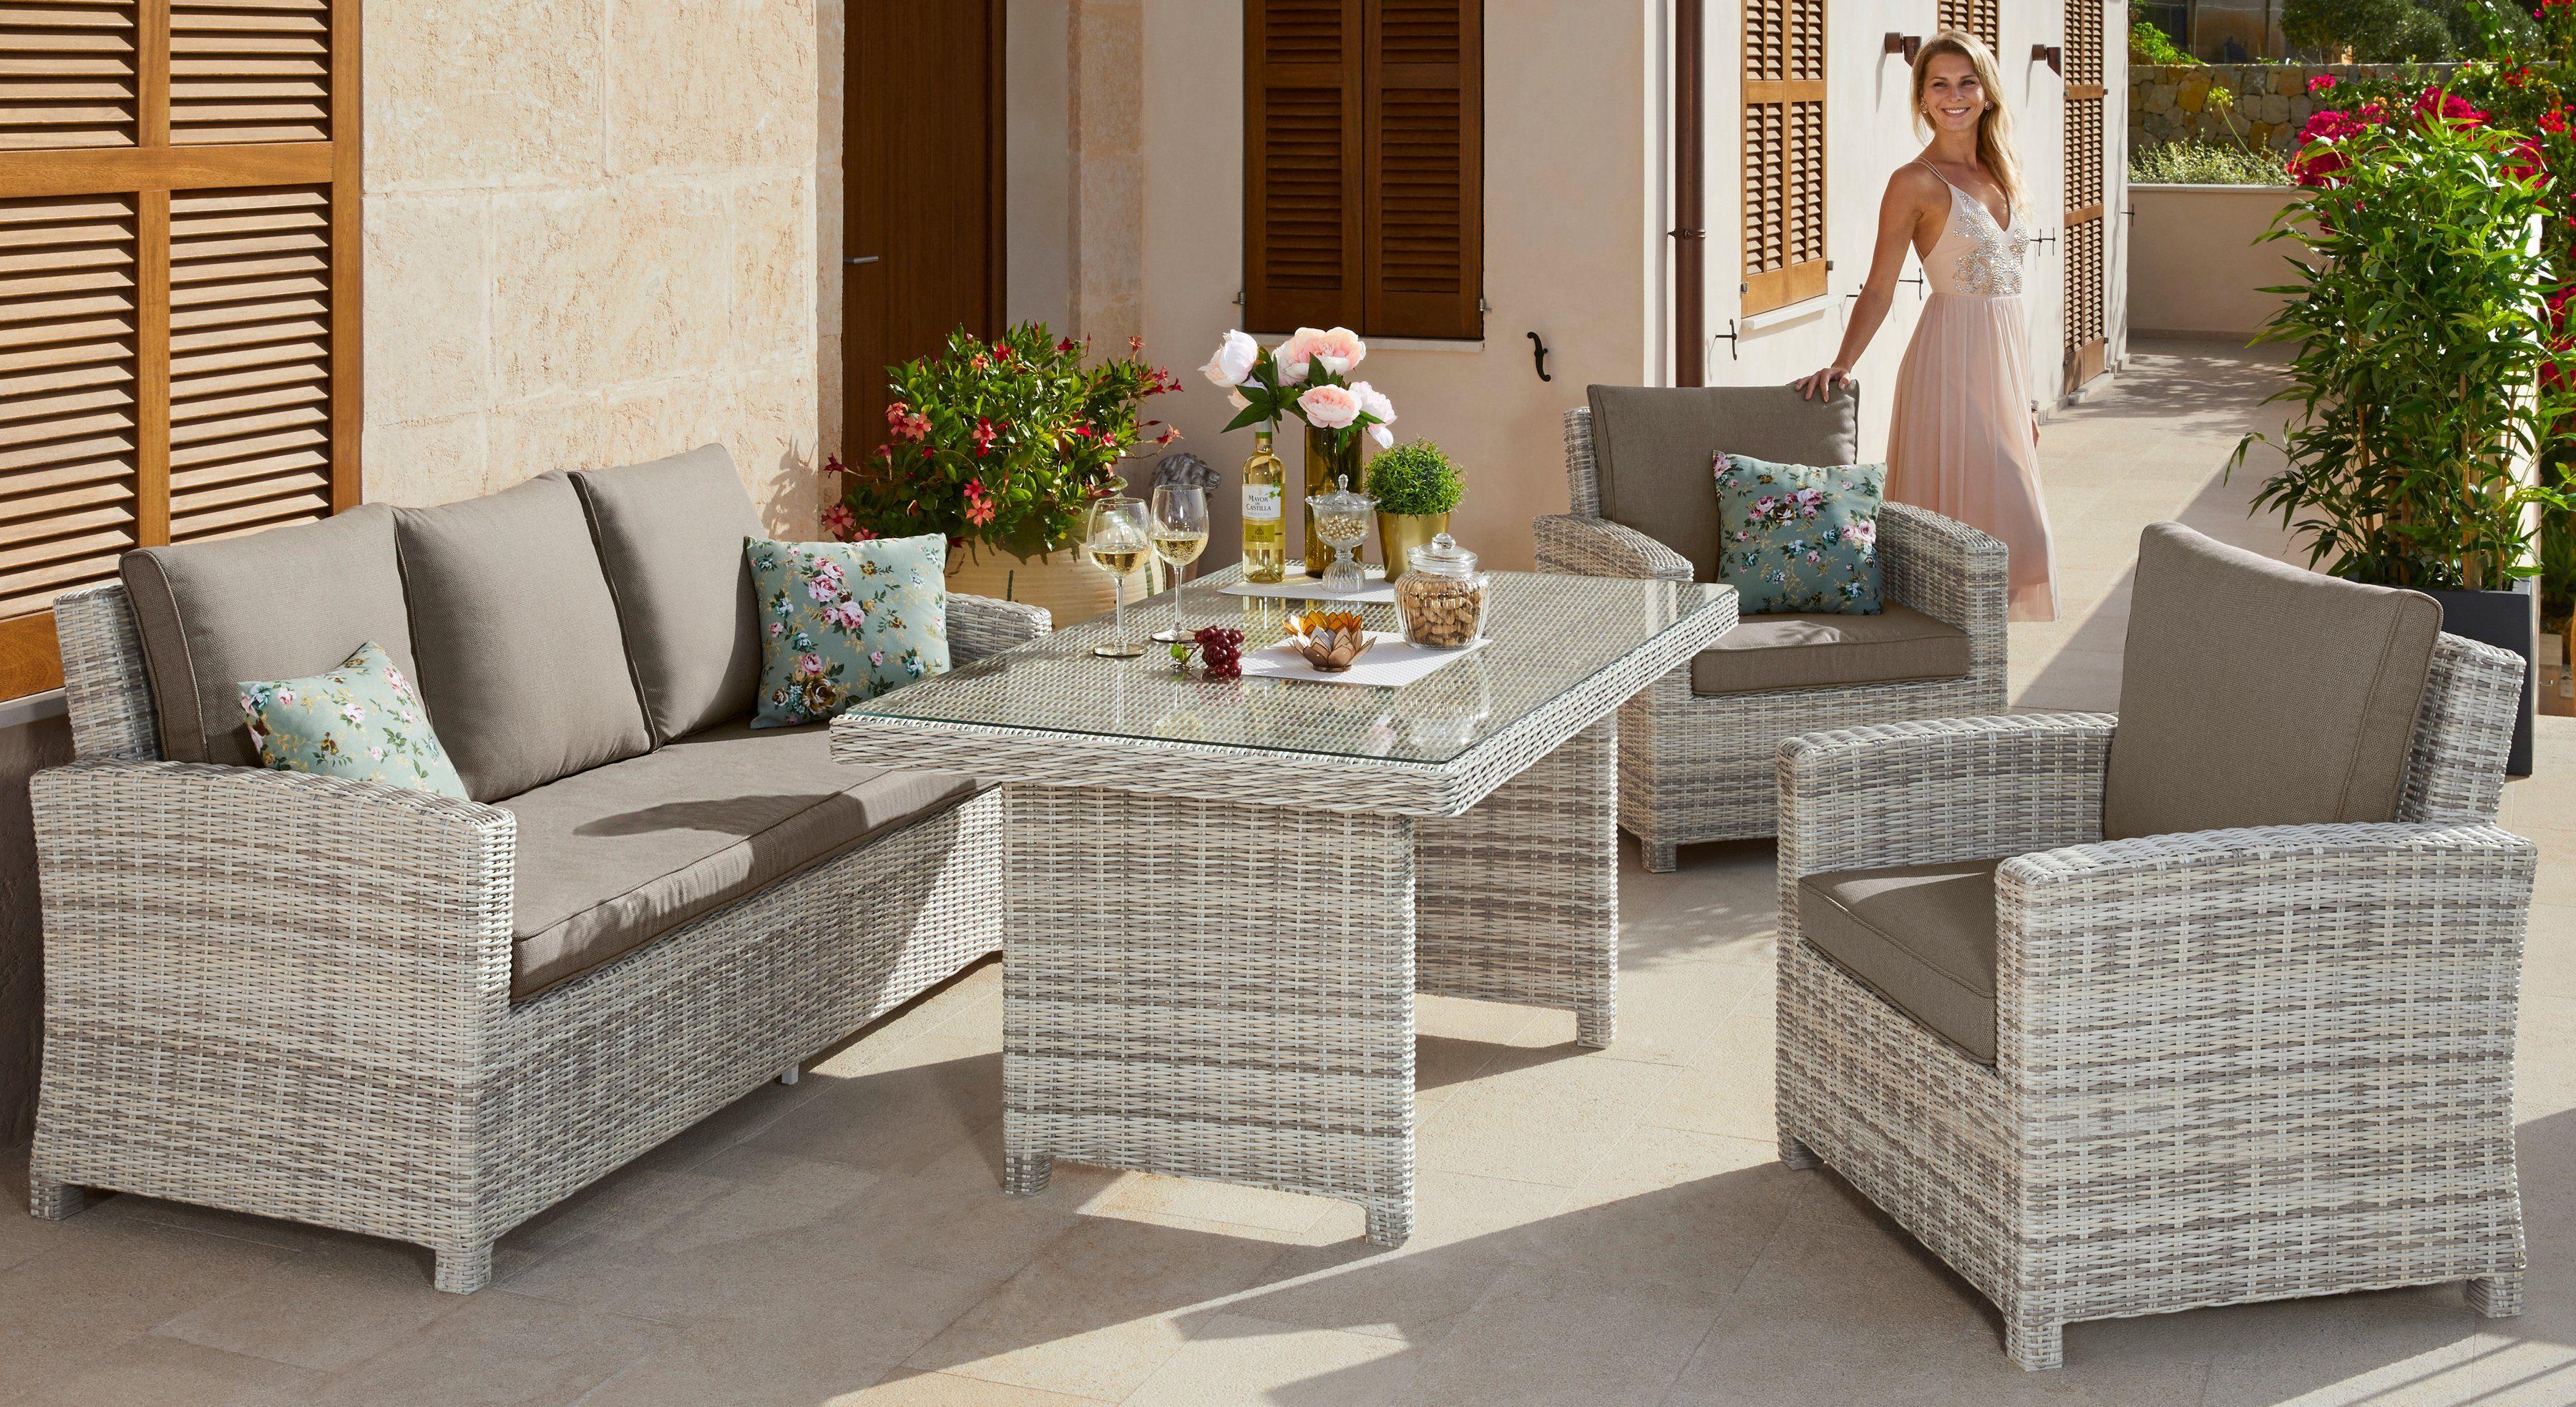 KONIFERA Gartenmöbelset »Bolero«, 15- tlg., Bank, 2 Sessel, Tisch 150x90 cm, Polyrattan, weiß